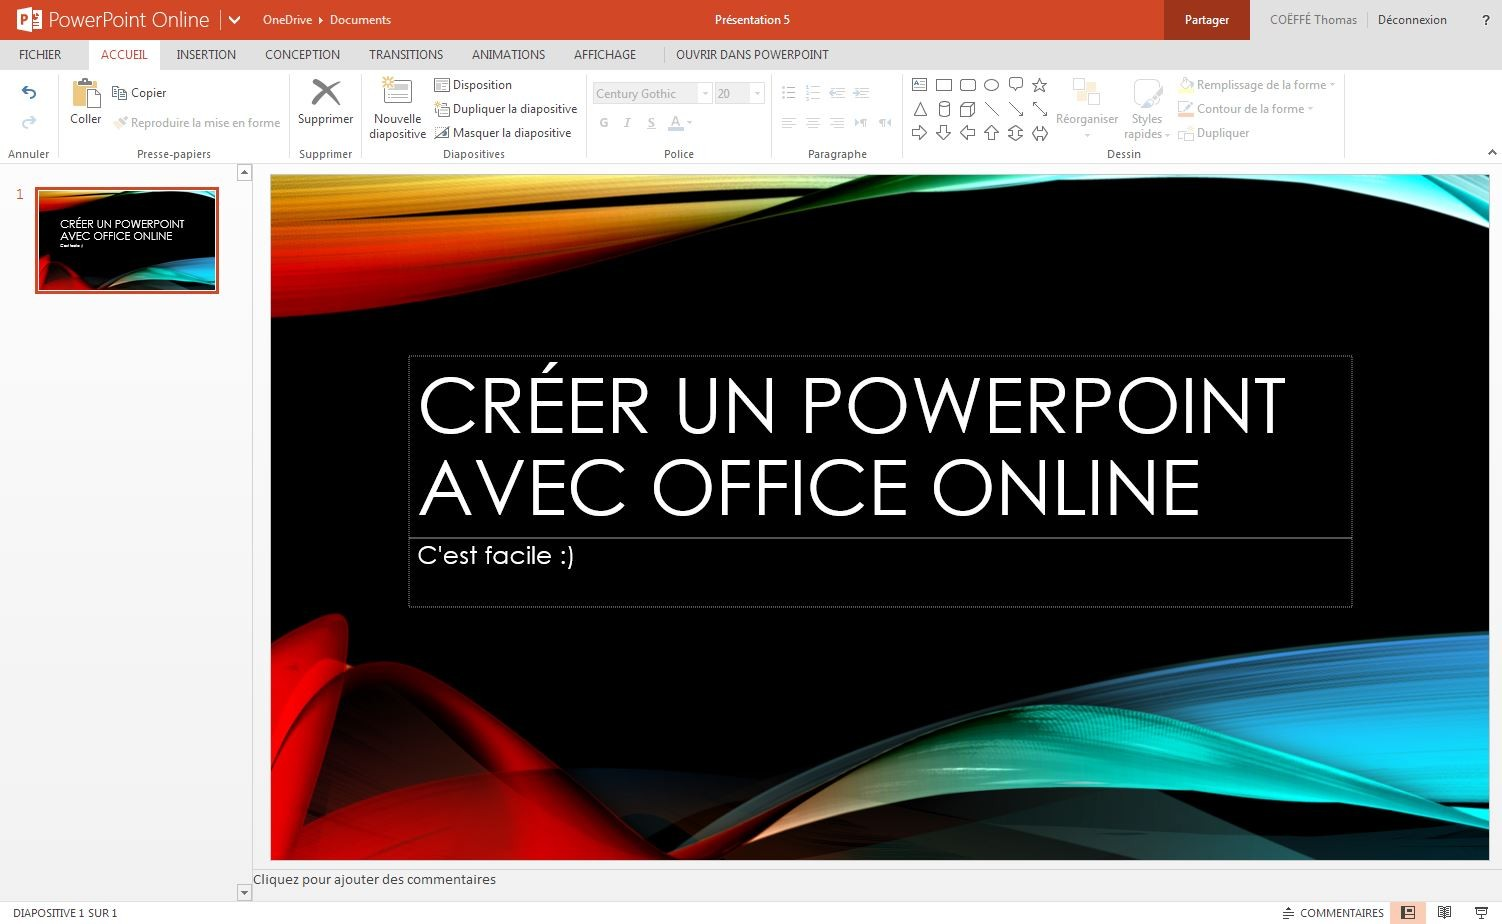 office online microsoft word excel et powerpoint disponibles